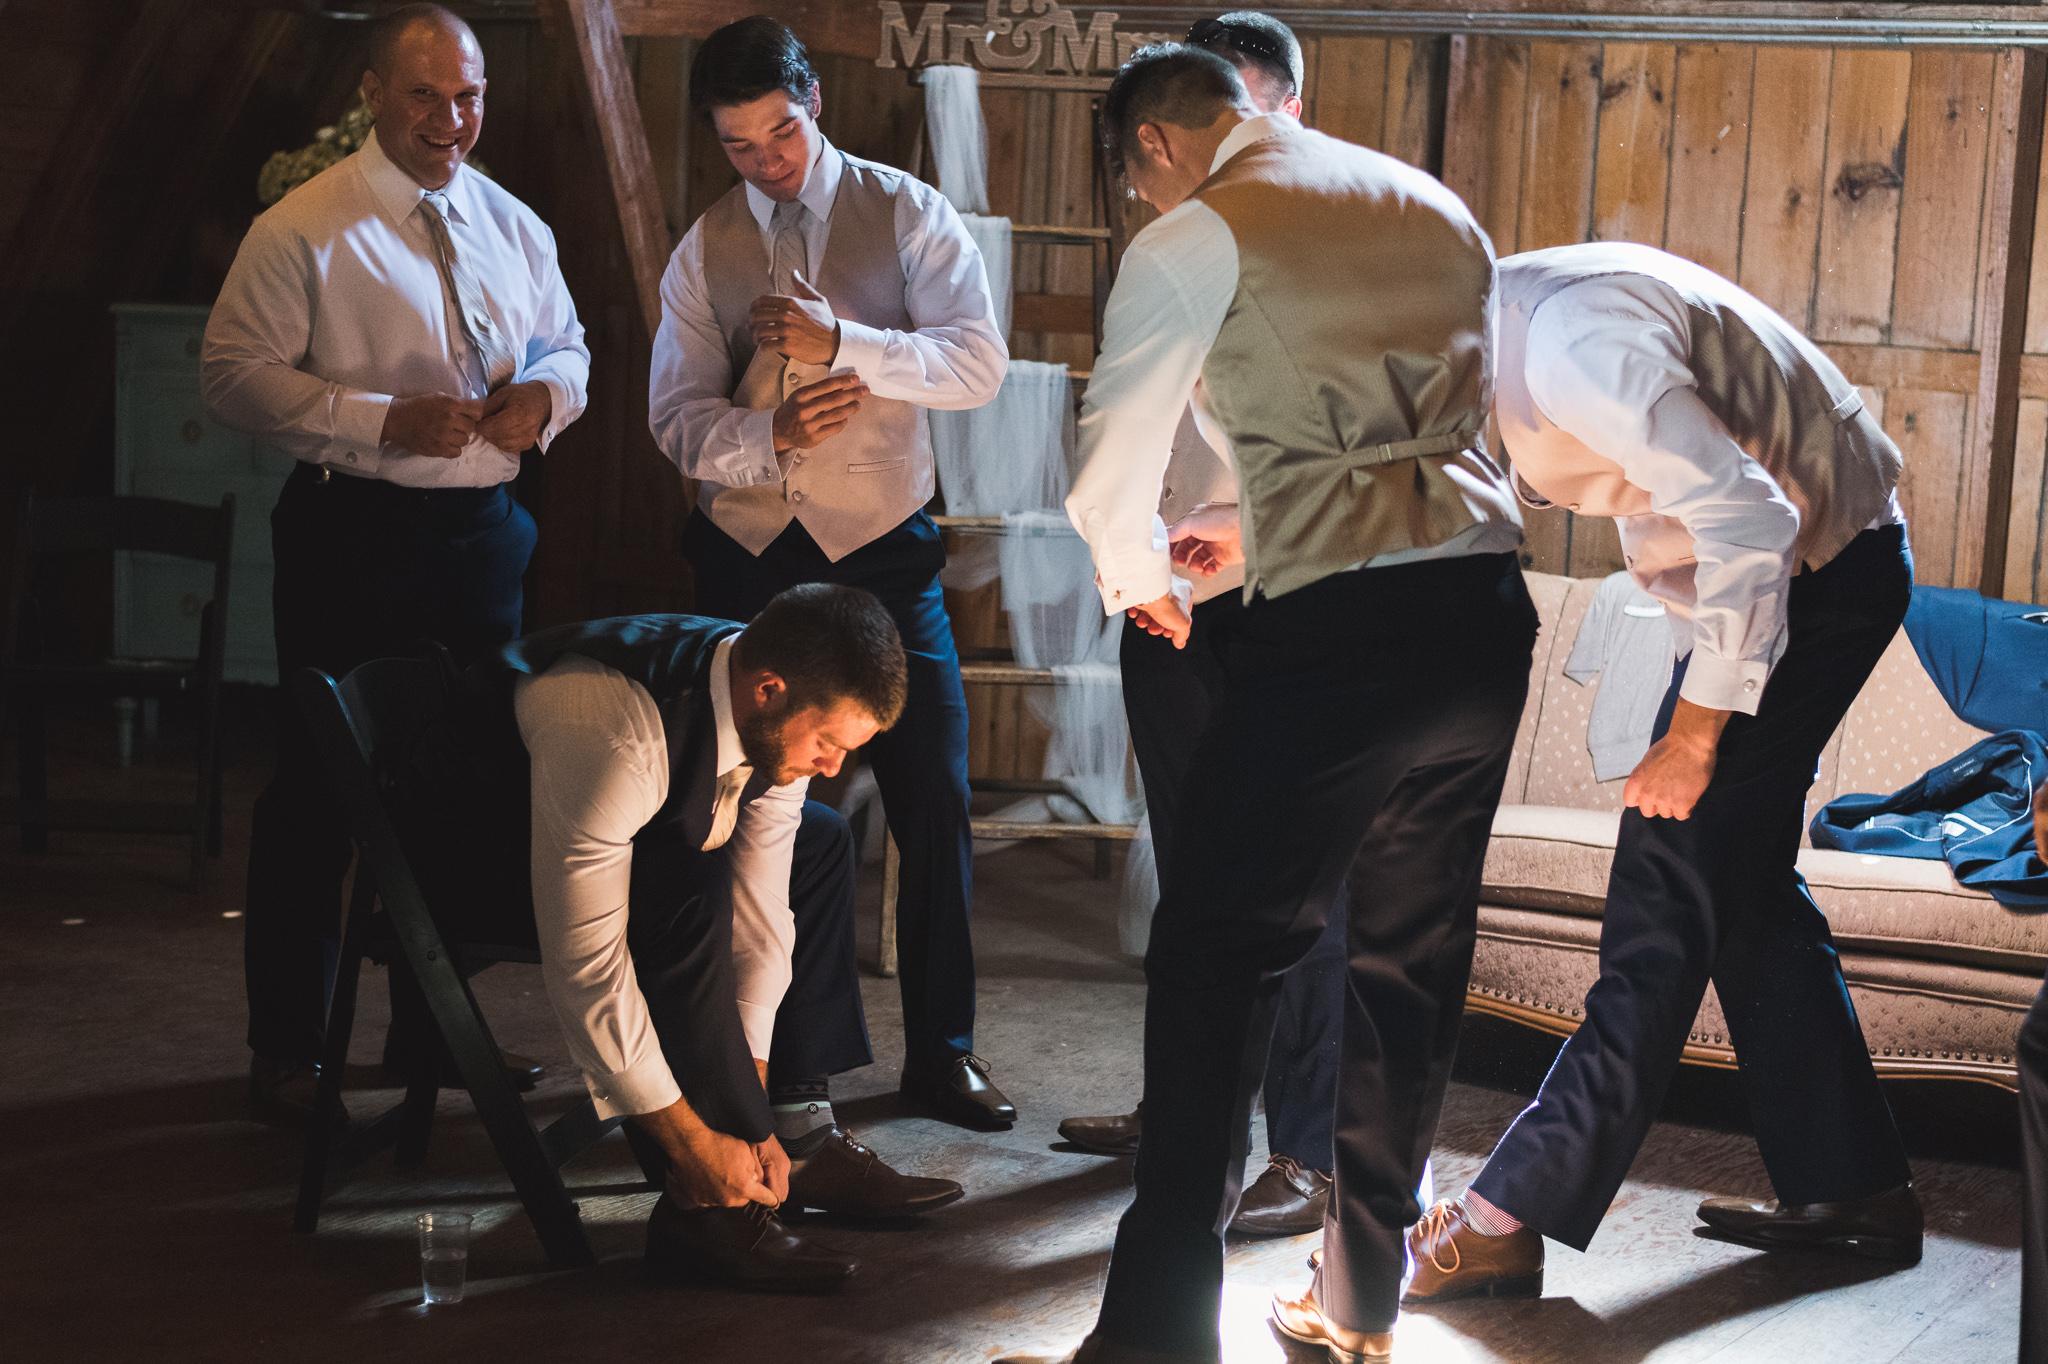 Chelsea Joy Photography | Fargo, ND Wedding Photographer